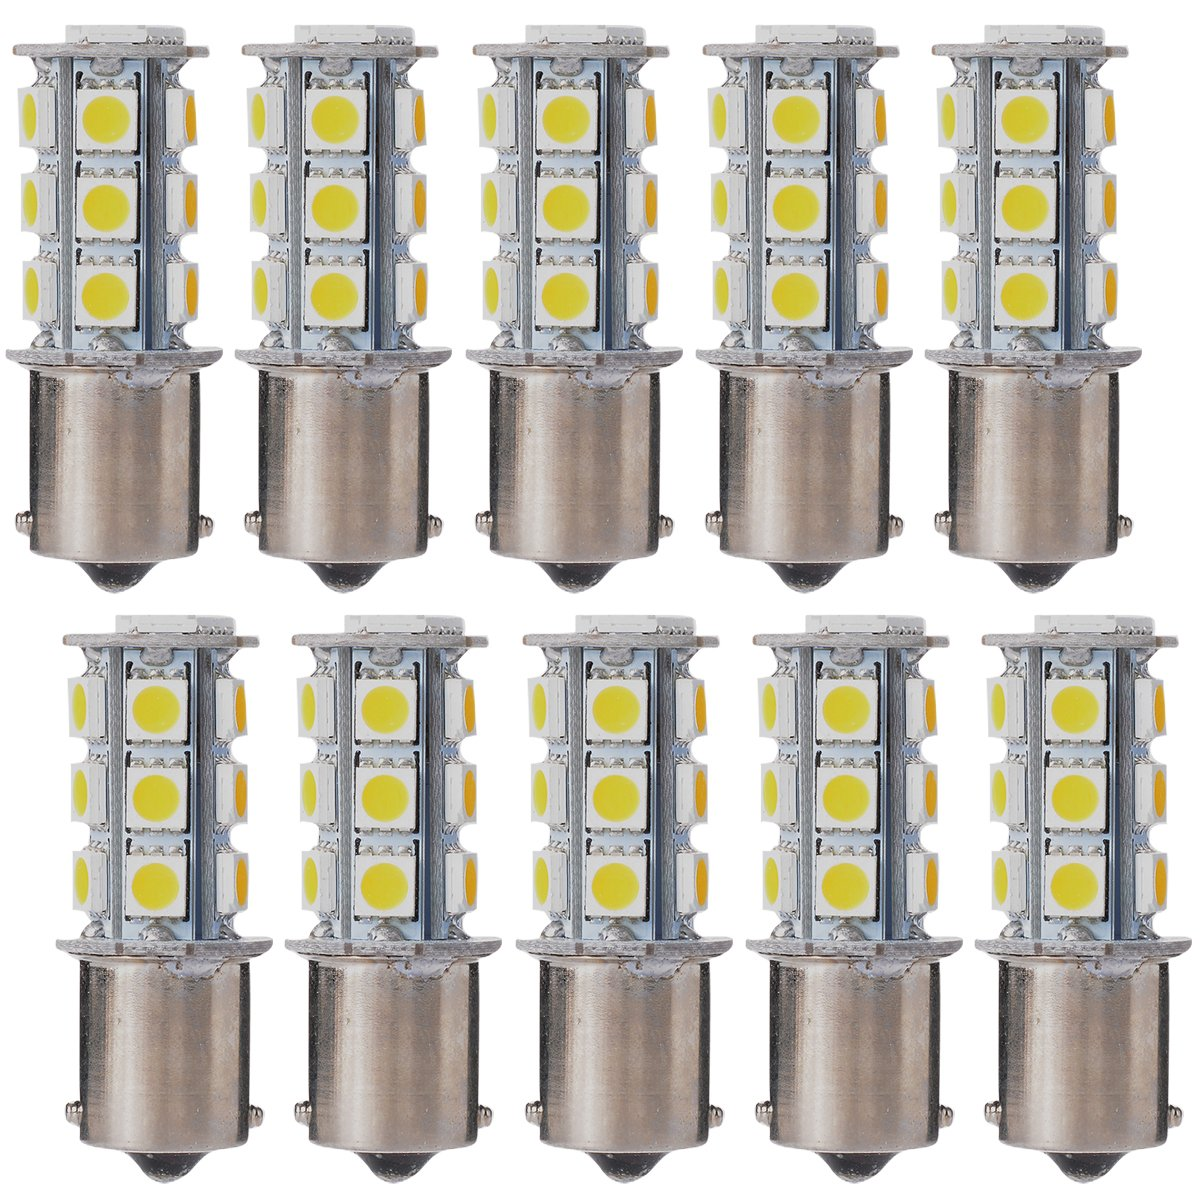 XCSOURCE 10X Warm White 1156 BA15S / 1141 / 1073 / 1095 Base 18 SMD 5050 LED Replacement Bulb For RV Camper SUV MPV Car Turn Tail Signal Brake Backup Light MA241 FBA_MA241